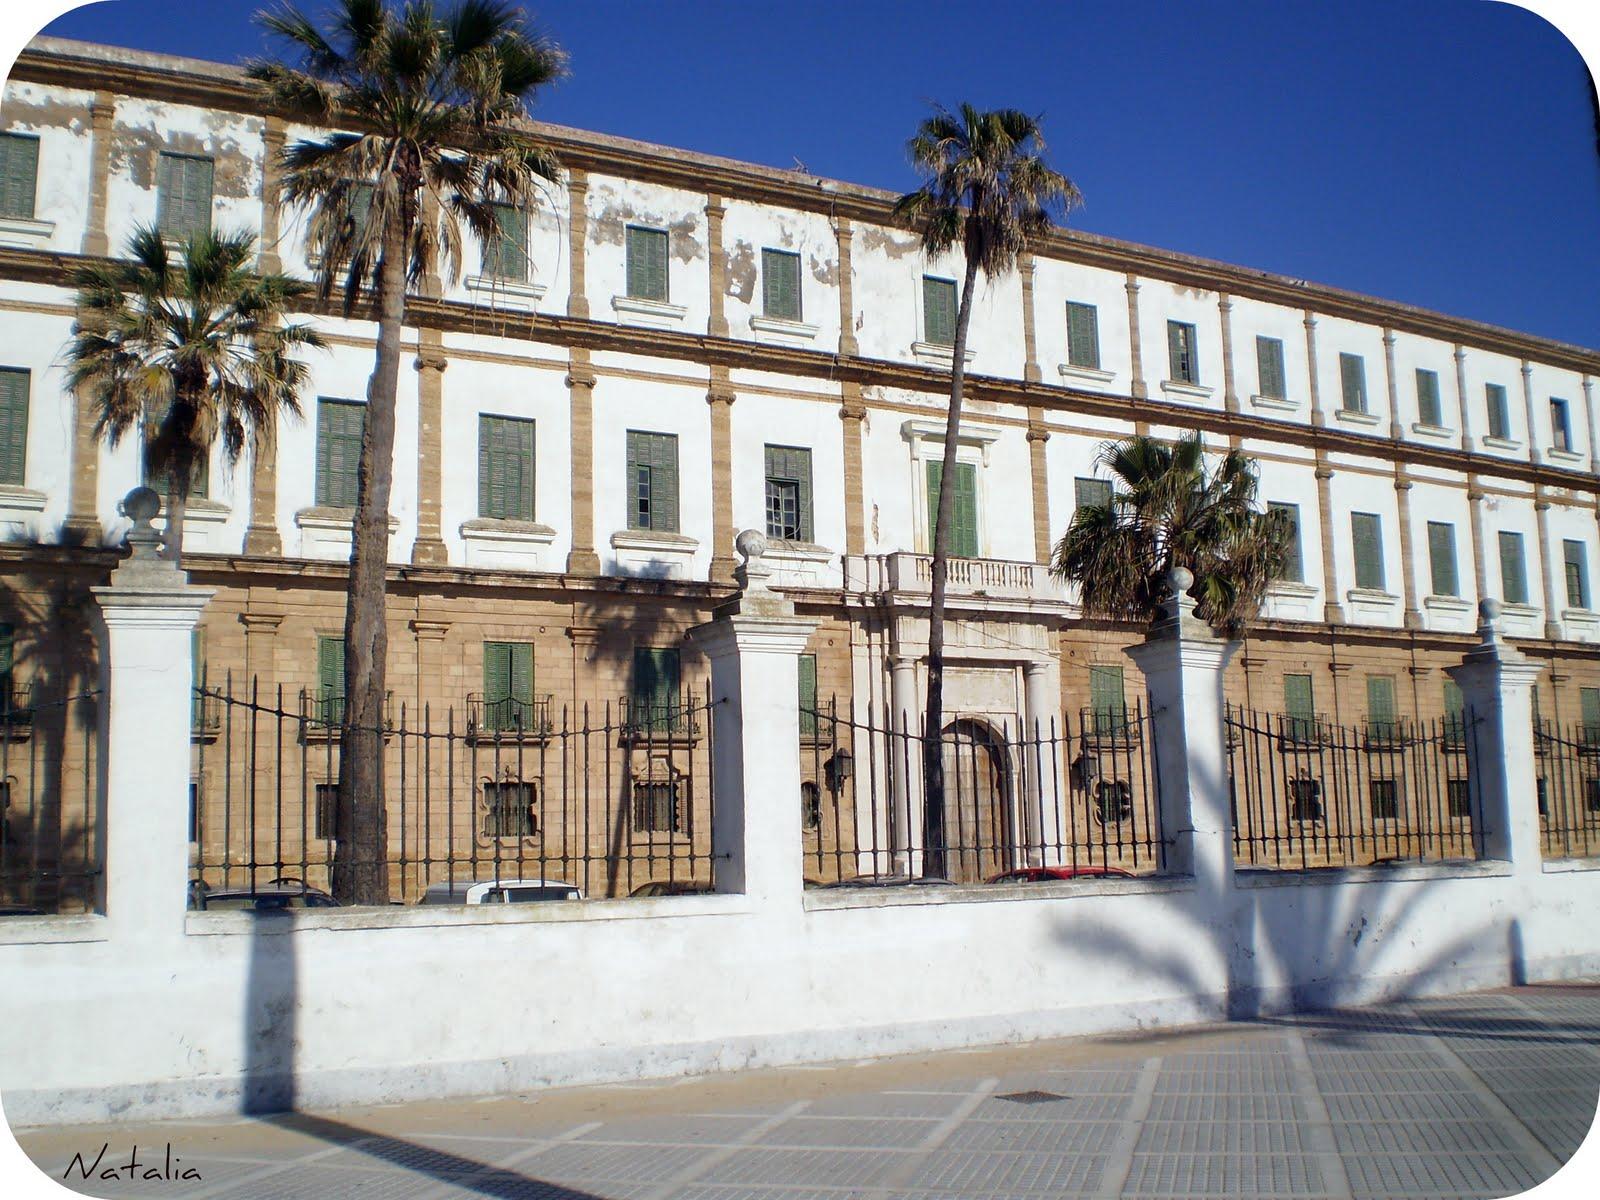 Colegio arquitectos de cadiz amazing las mejores ideas sobre colegio arquitectos en colegio de - Colegio de arquitectos cadiz ...